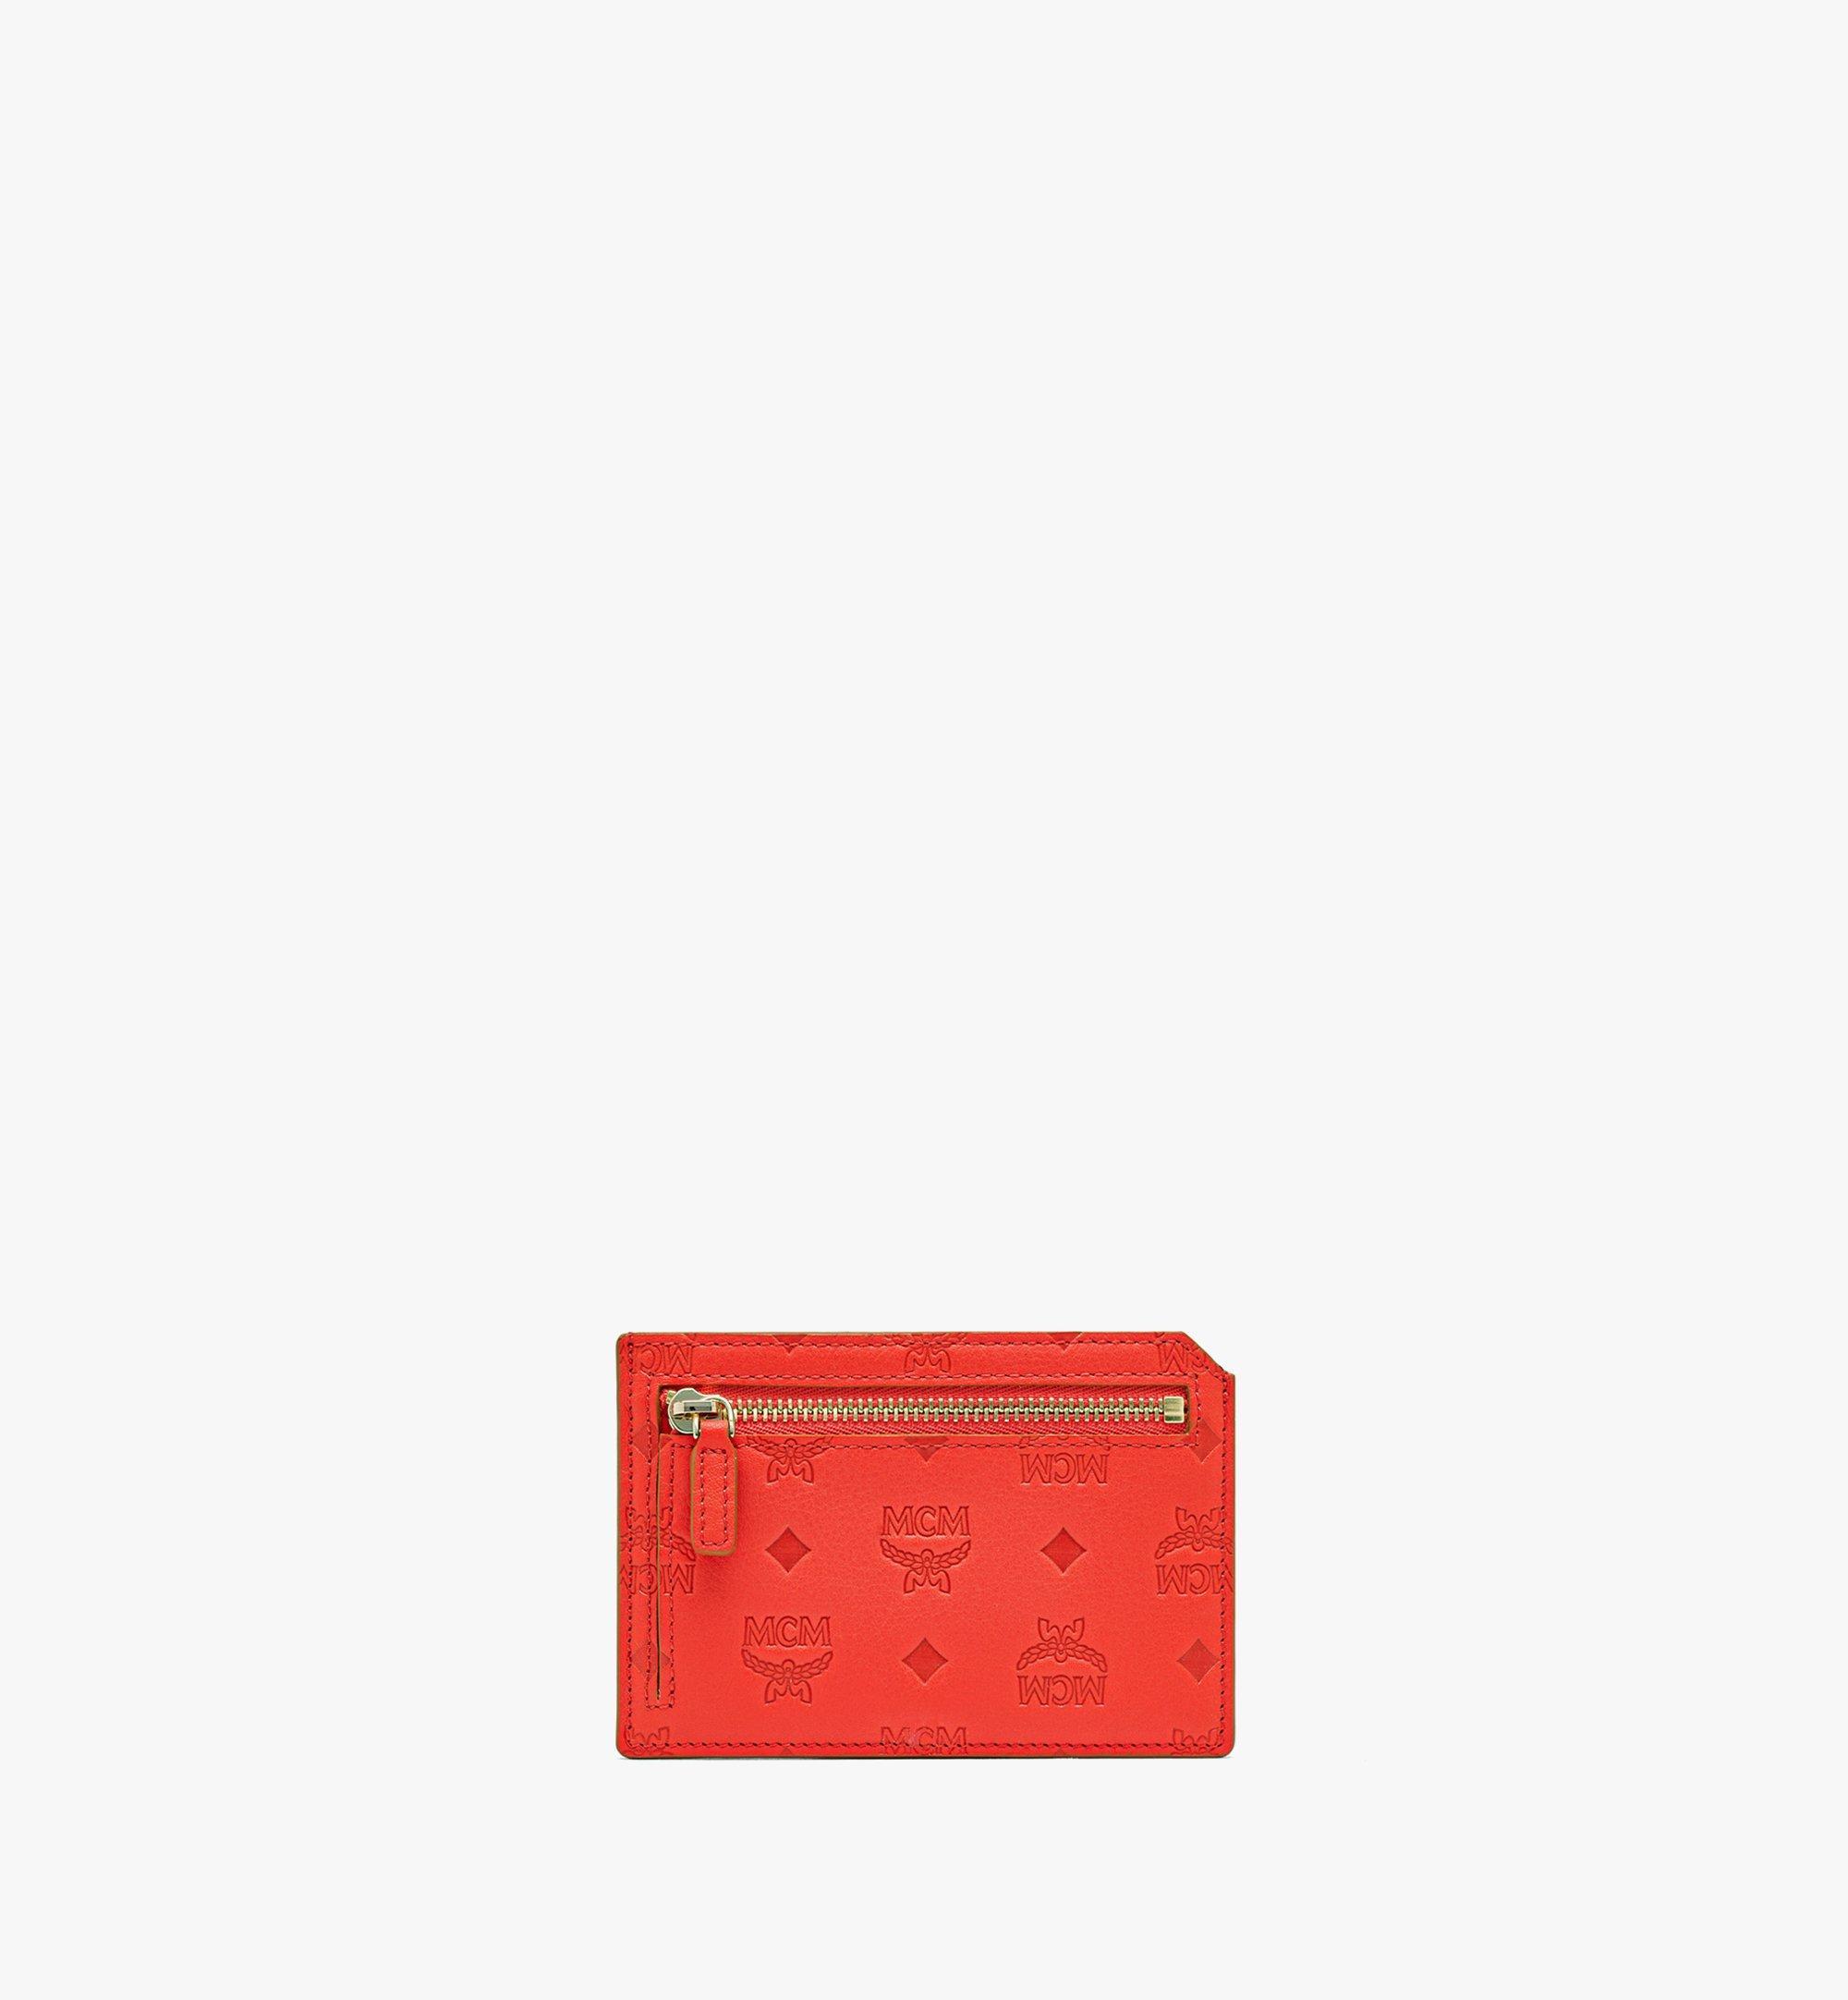 MCM Klara Multifunction Card Holder in Monogram Leather Red MYABSKM01R8001 Alternate View 1